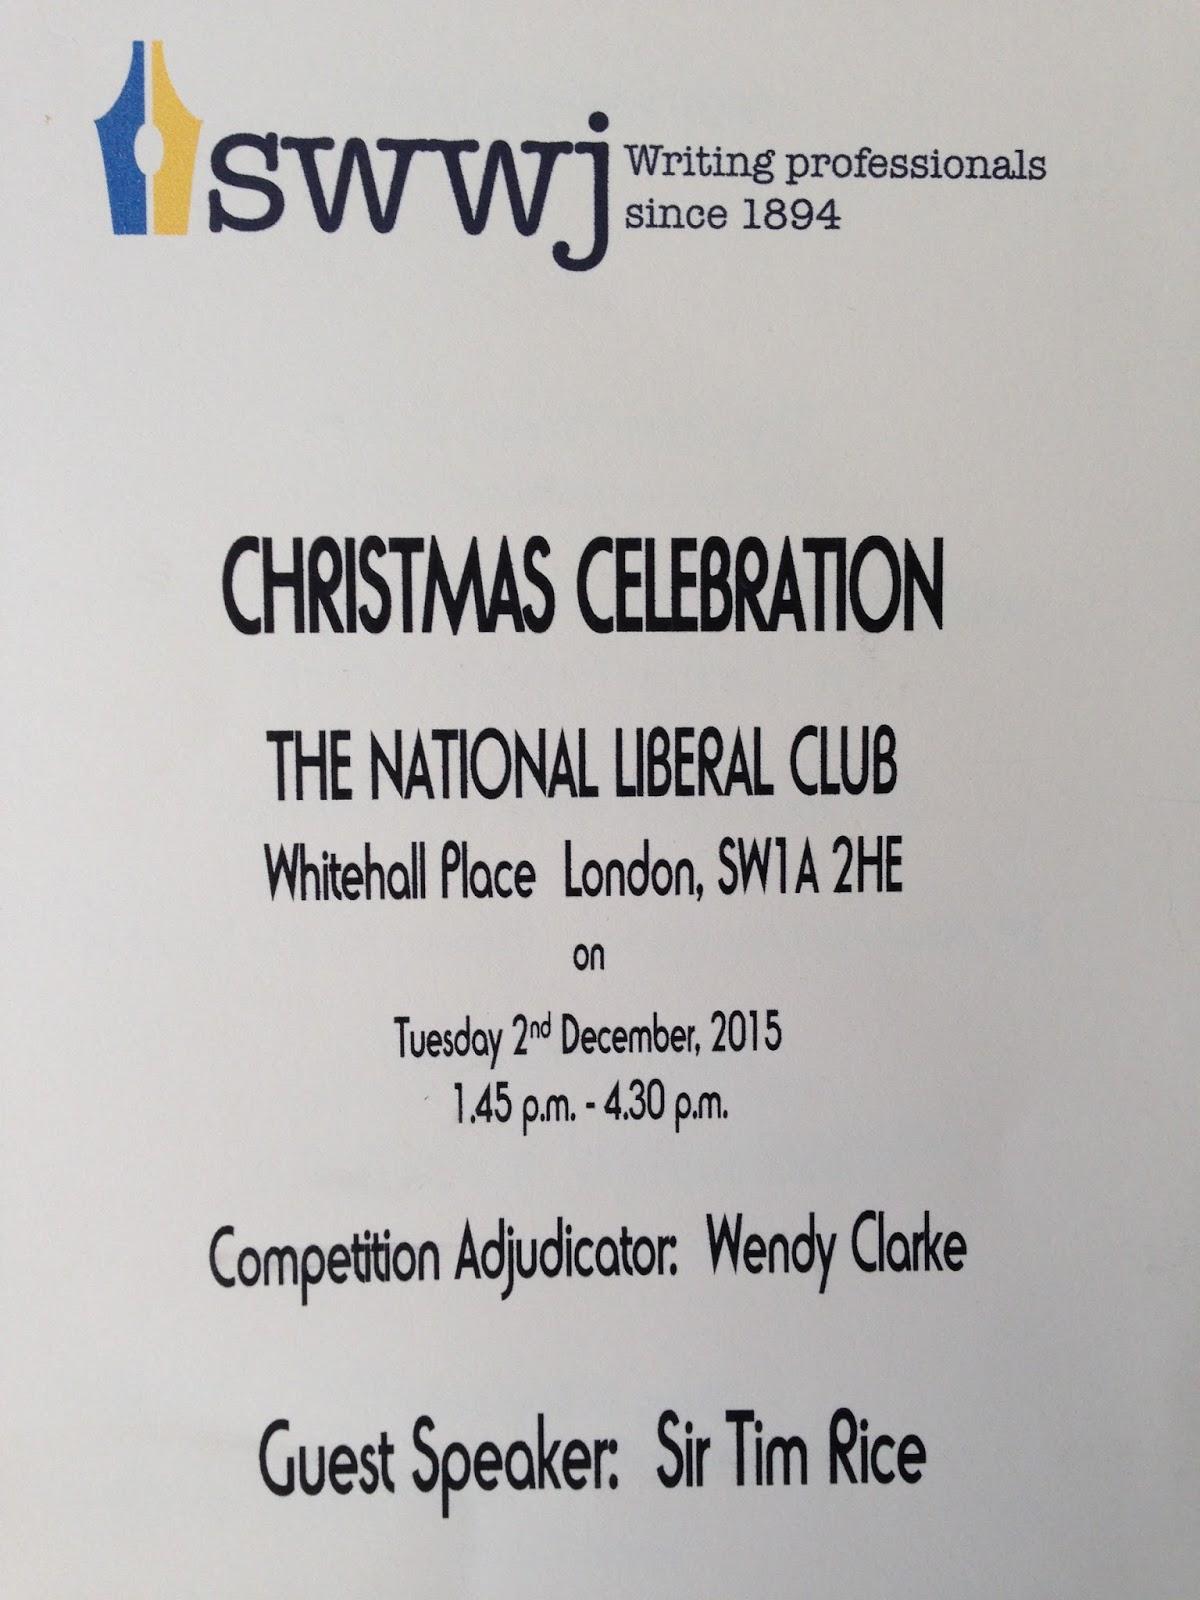 Wendy\'s Writing Now: The SWWJ Christmas Tea... and Meeting Sir Tim Rice